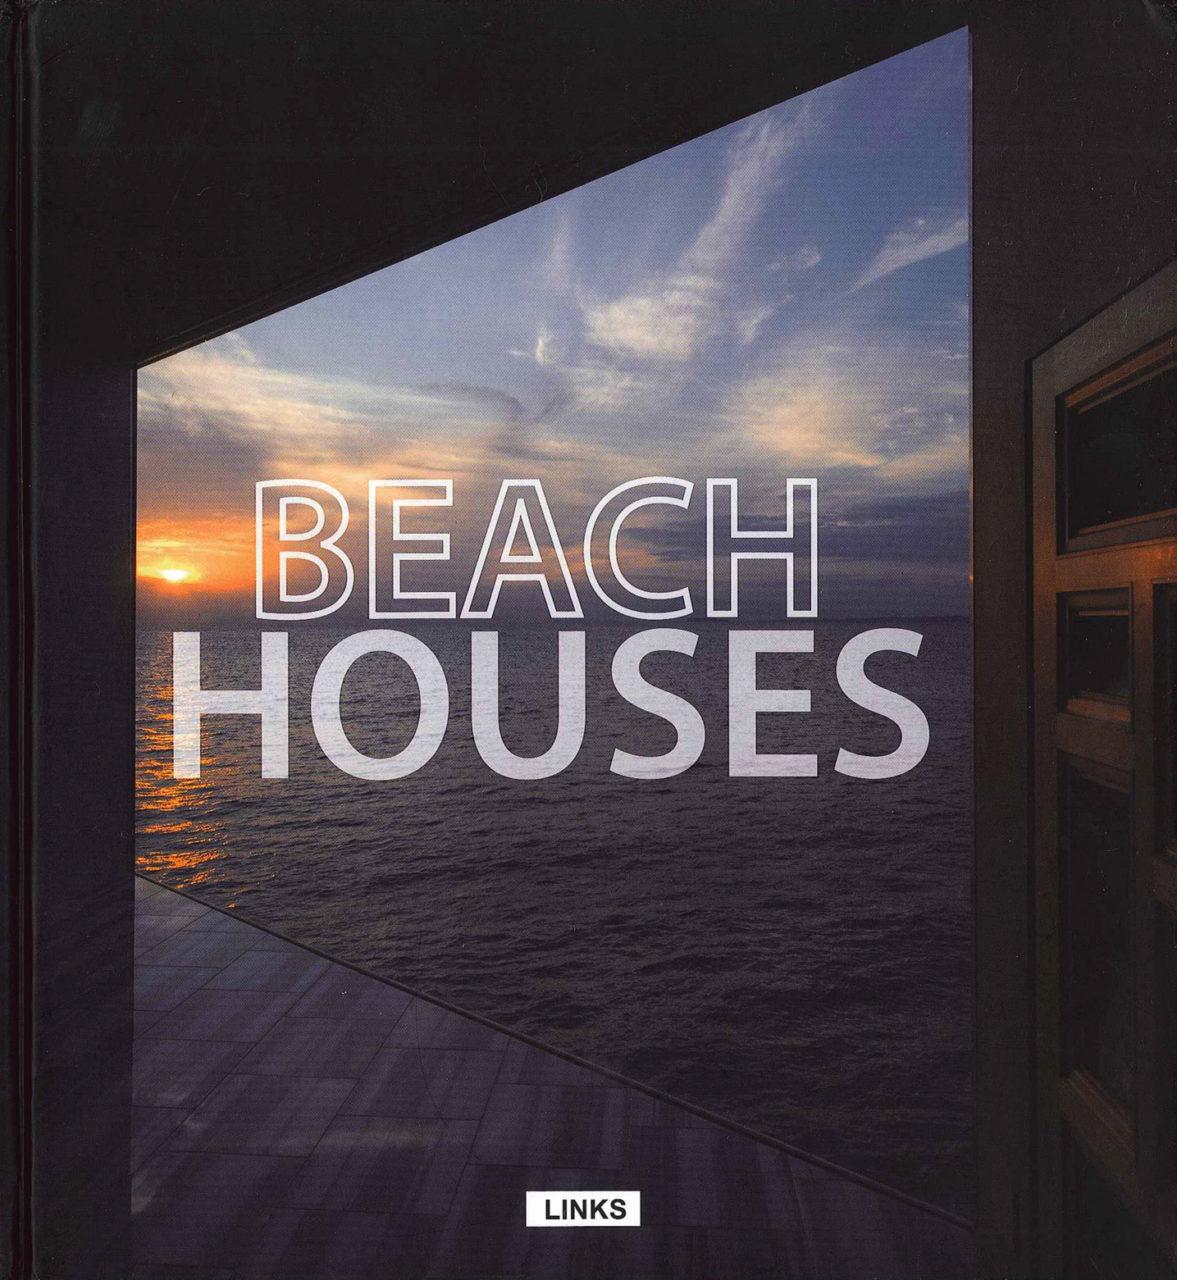 http://www.saota.com/wp-content/uploads/2018/01/BeachHouses_SAOTA_Page_01.jpg